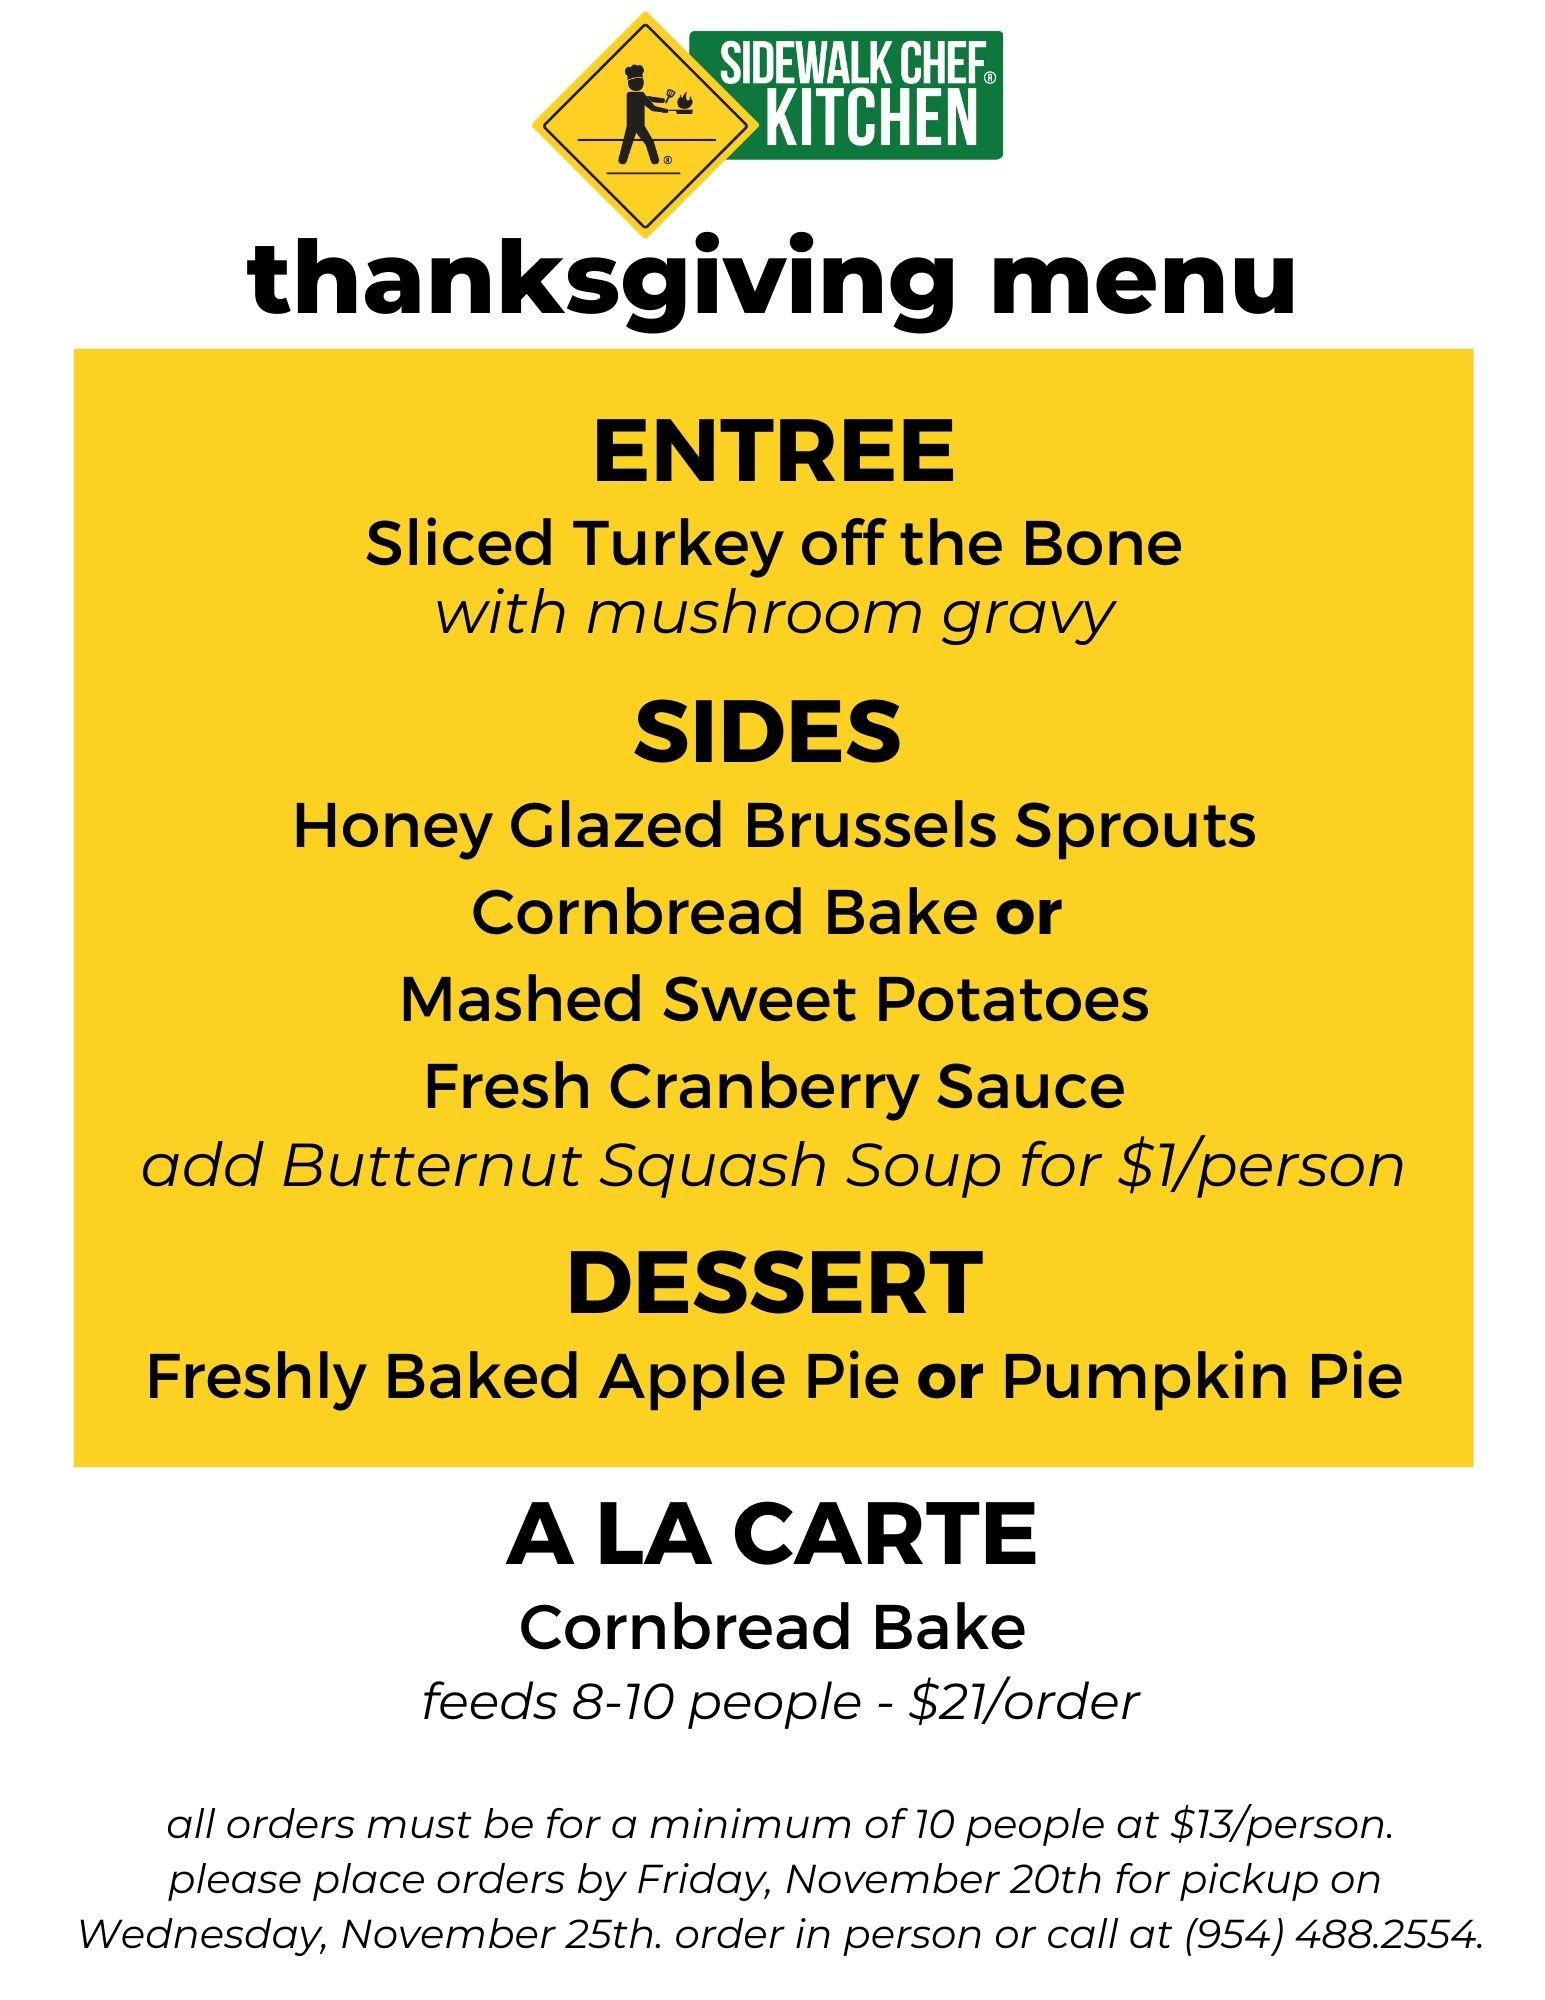 Thanksgiving Catering at Sidewalk Chef Kitchen